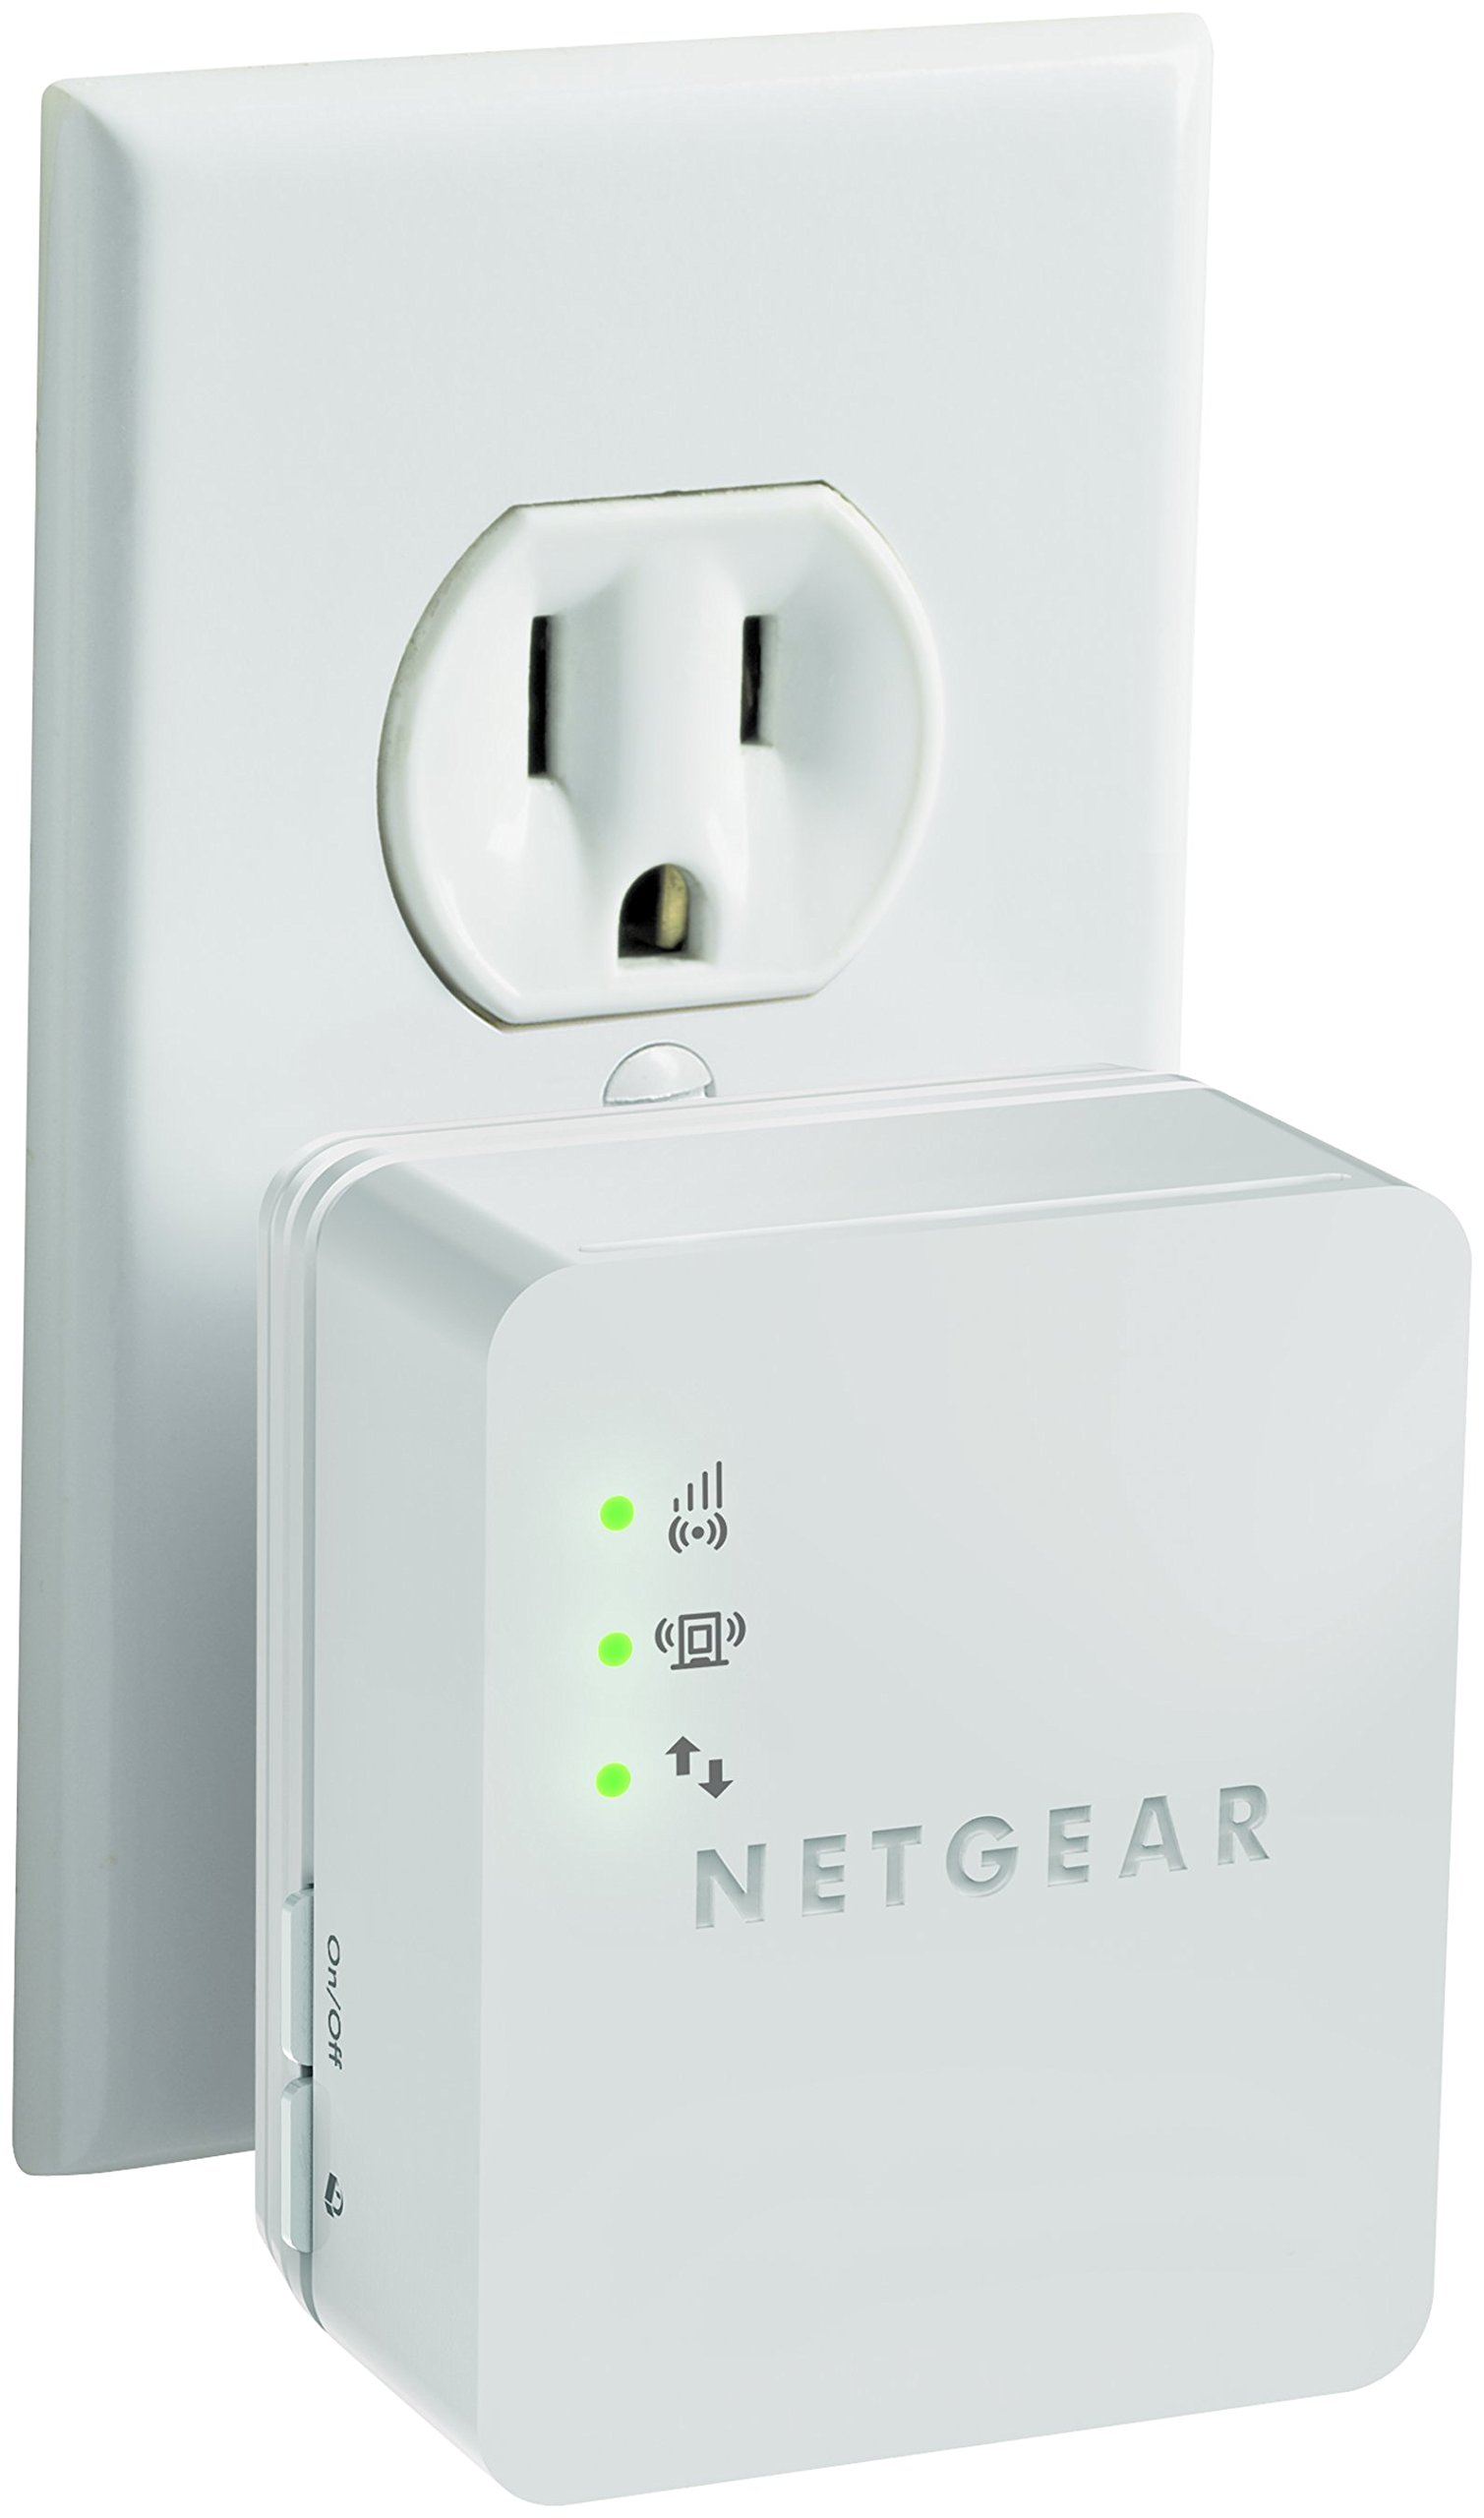 NETGEAR N150 Wi-Fi Range Extender for Mobile - Wall Plug Version (WN1000RP) by NETGEAR (Image #6)